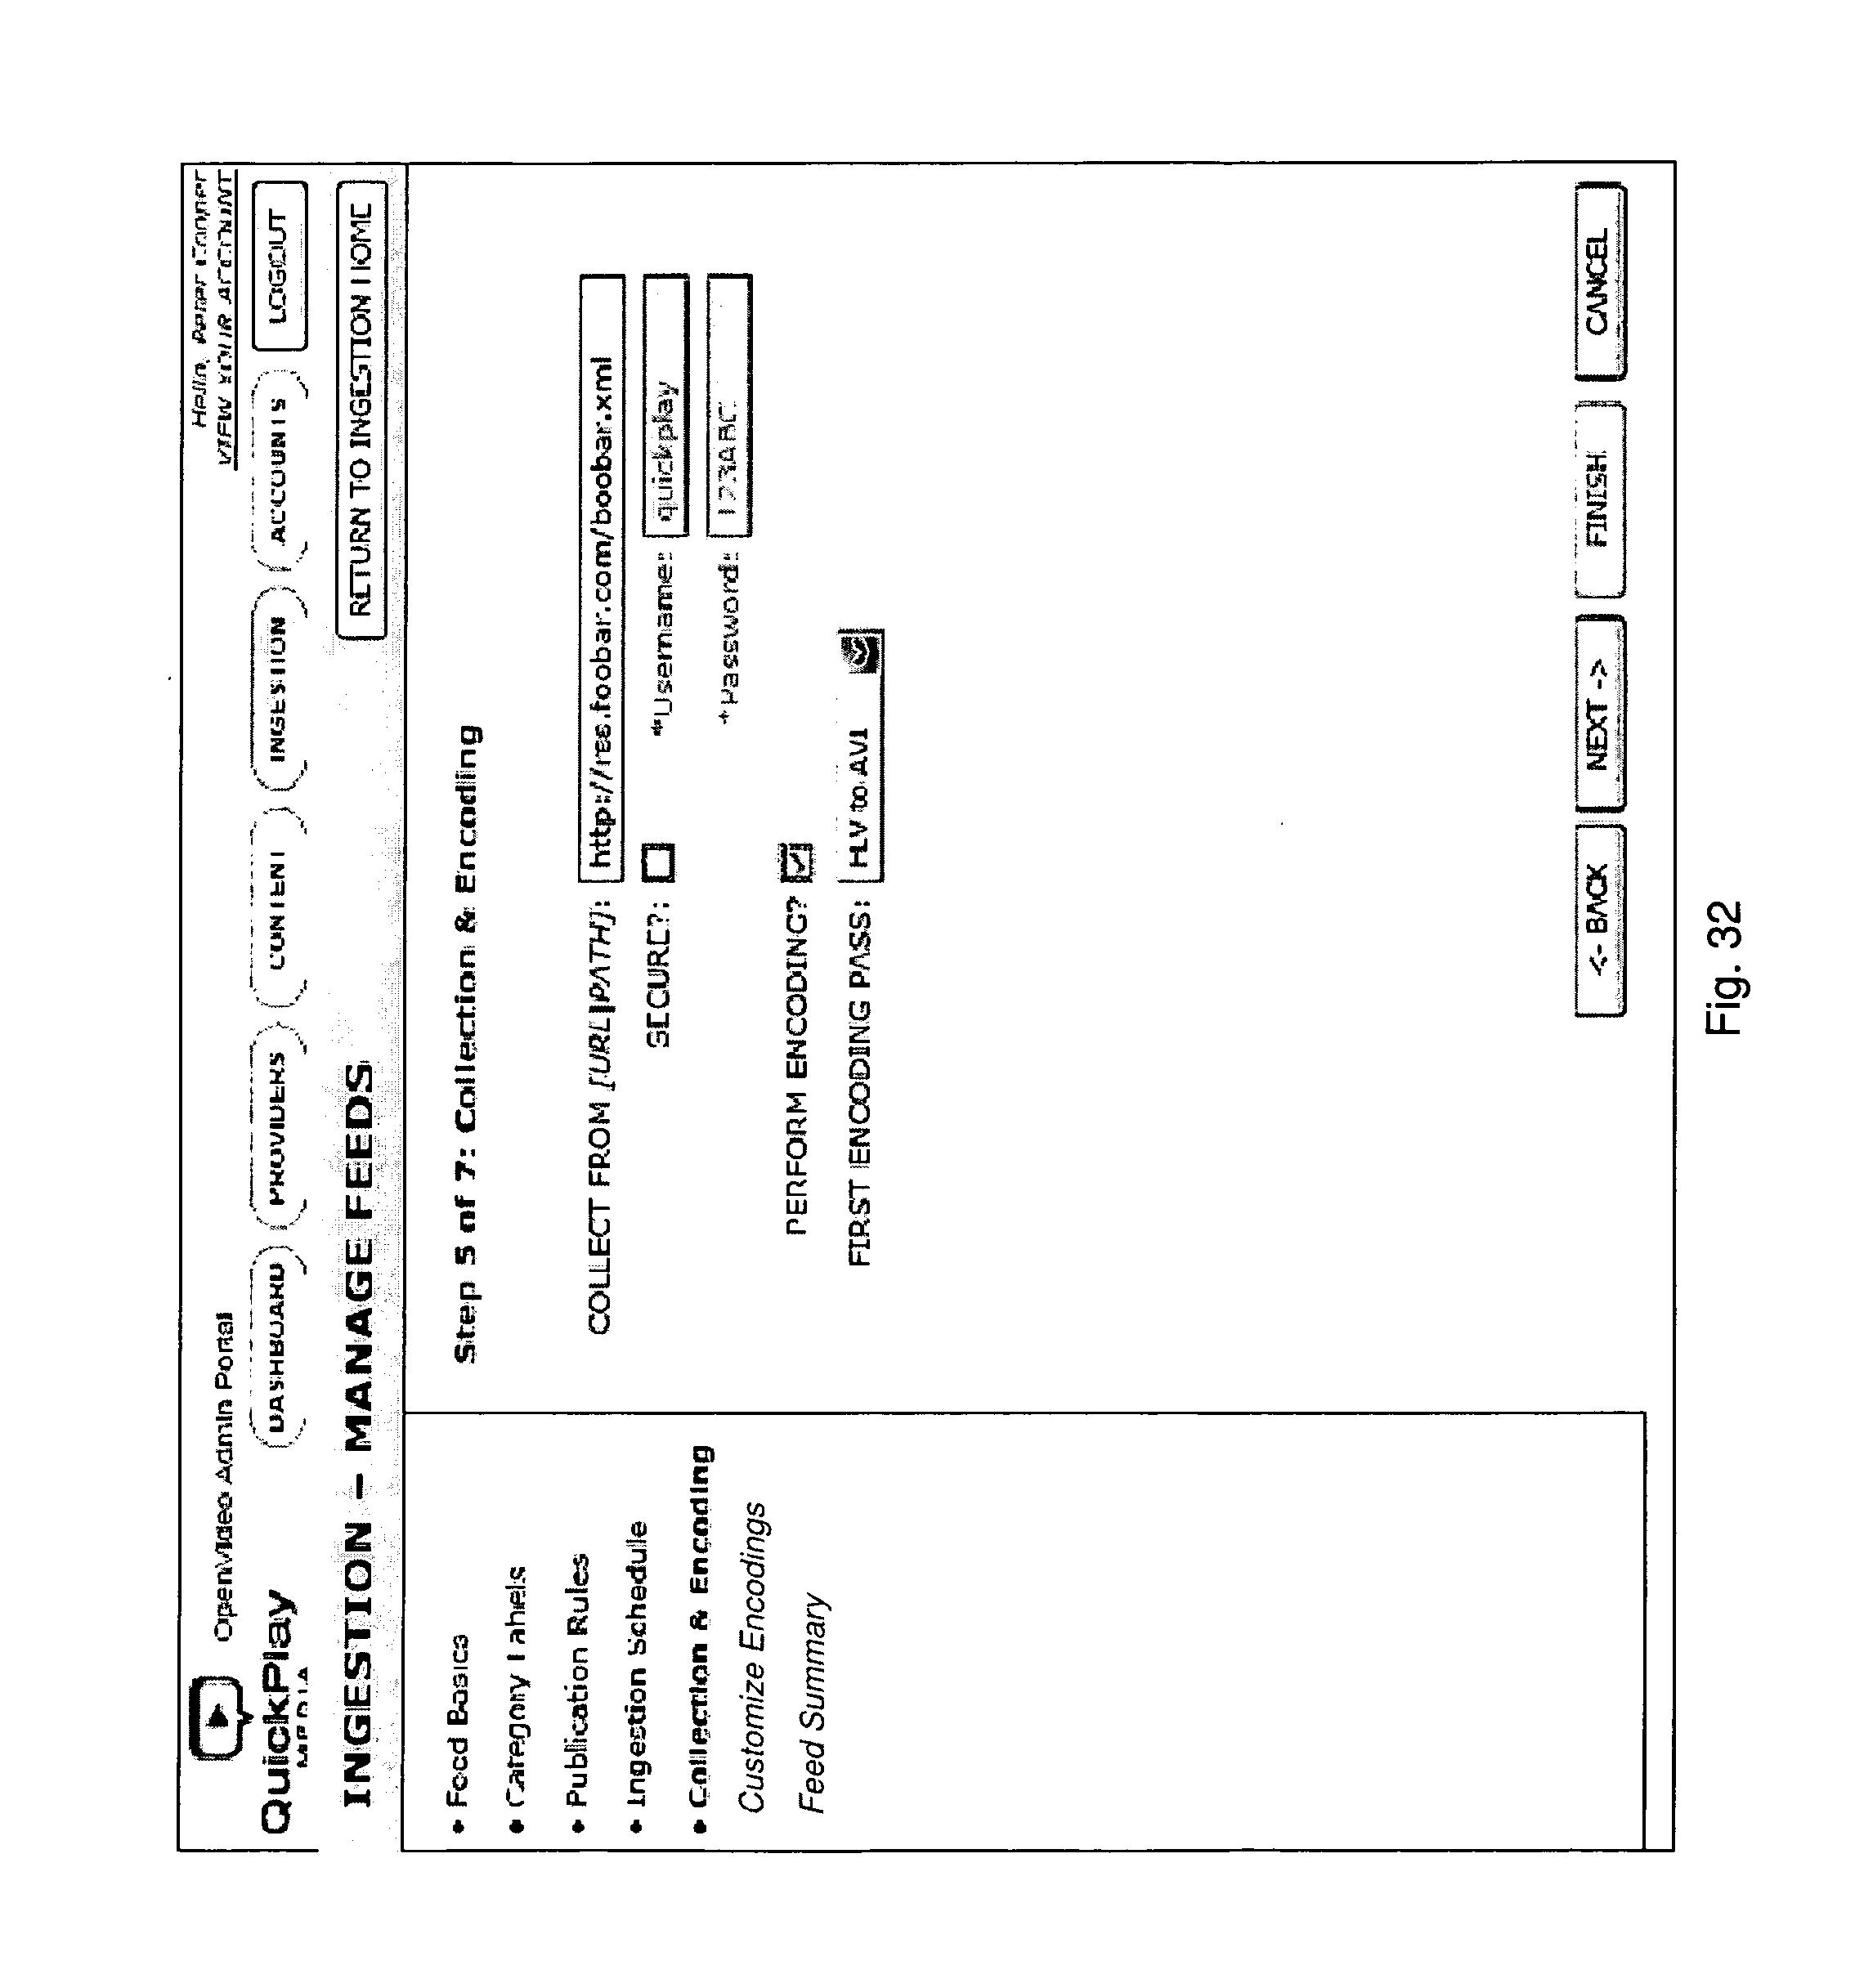 patent images